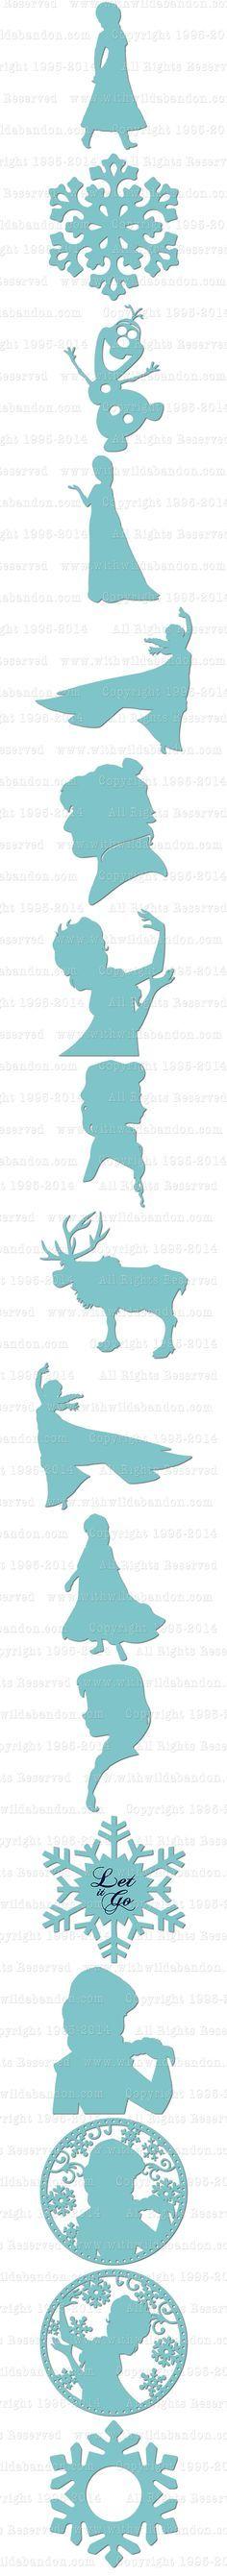 Frozen SVG, Frozen Silhouettes, Anna SVG, Elsa SVG, Anna Silhouette, Elsa Silhouette, Vector, Princess SVG, png, ai, eps Frozen, Clipart, Silhouettes, Anna, Elsa, Sven, Olaf, Princess, Snowflake, svg, png, vector, Graphics, Explore or Cameo Silhouette